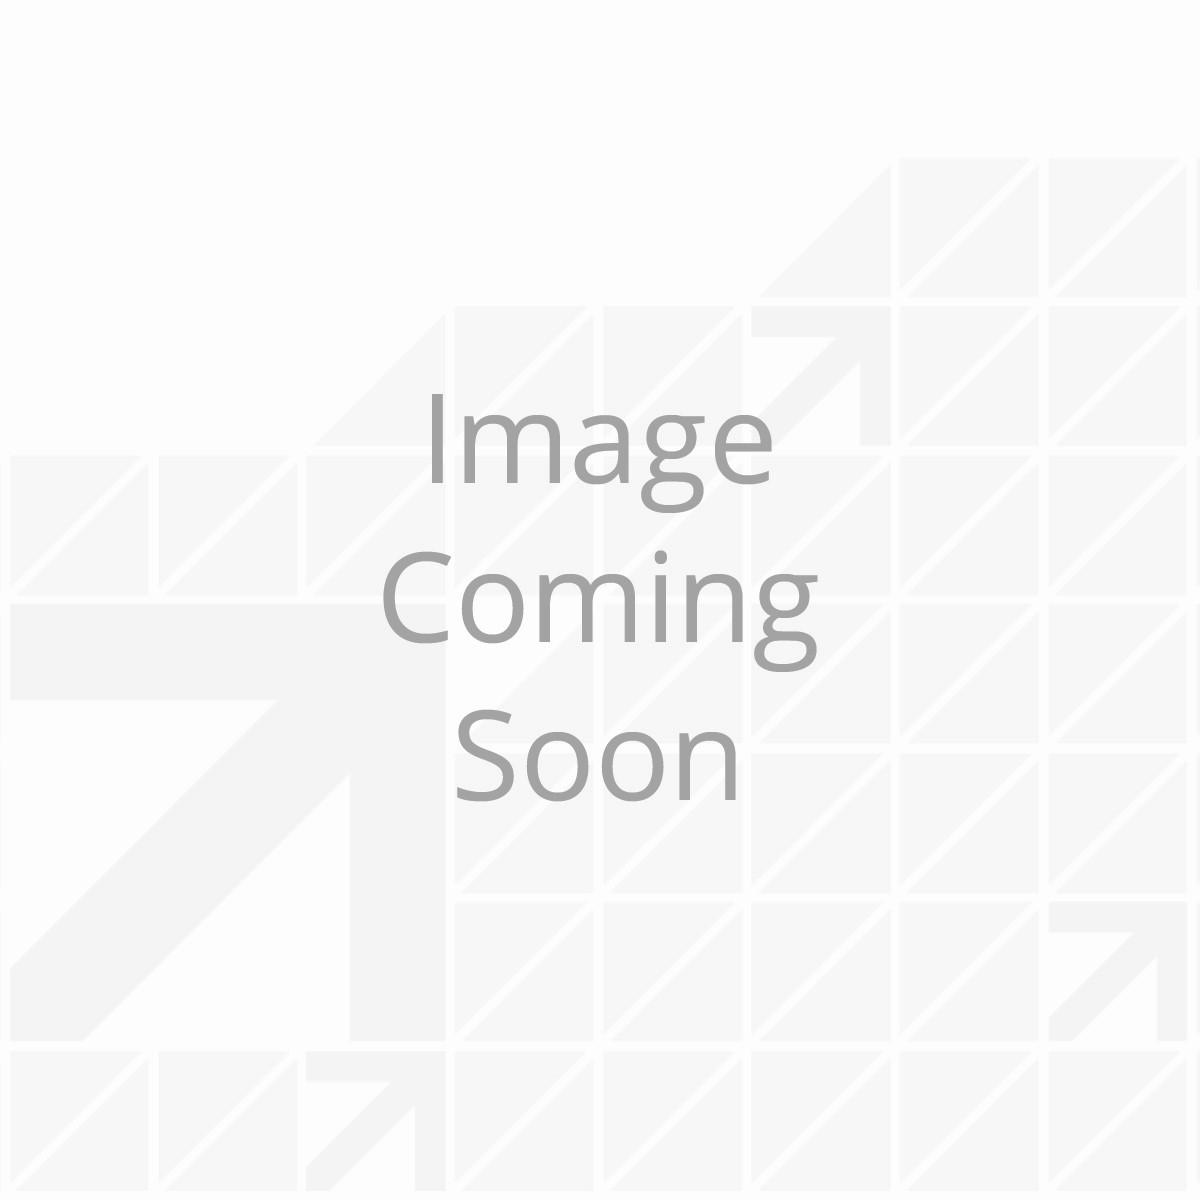 BikeWing_Jack-IT_2.png